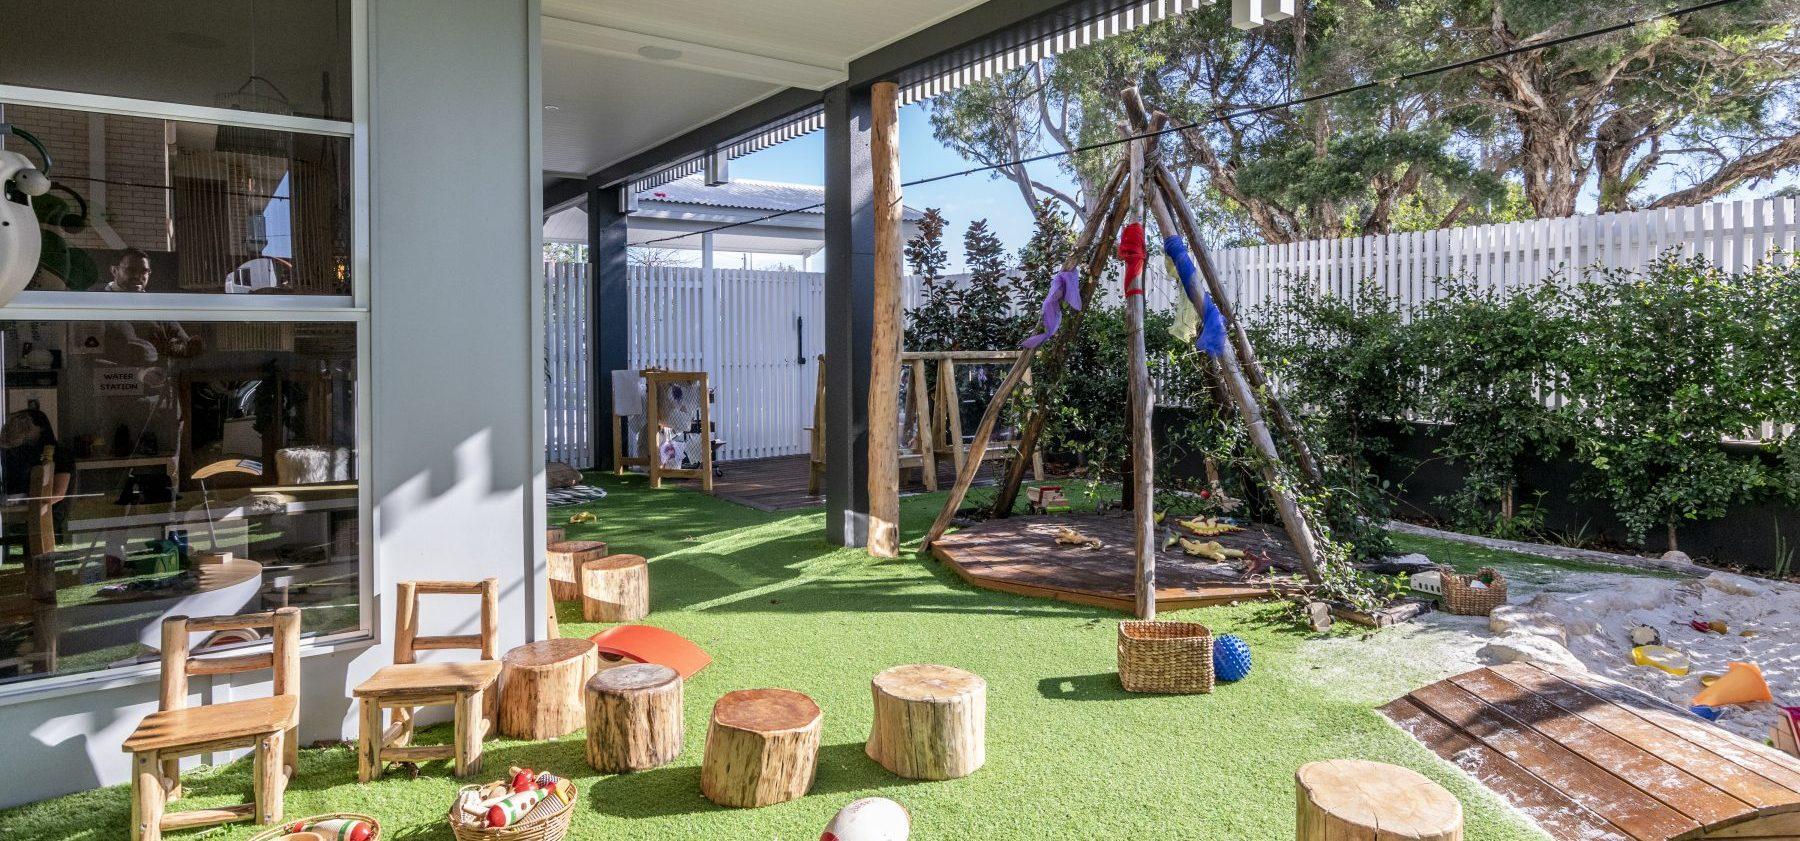 Donaldson Street Childcare Exterior Play area